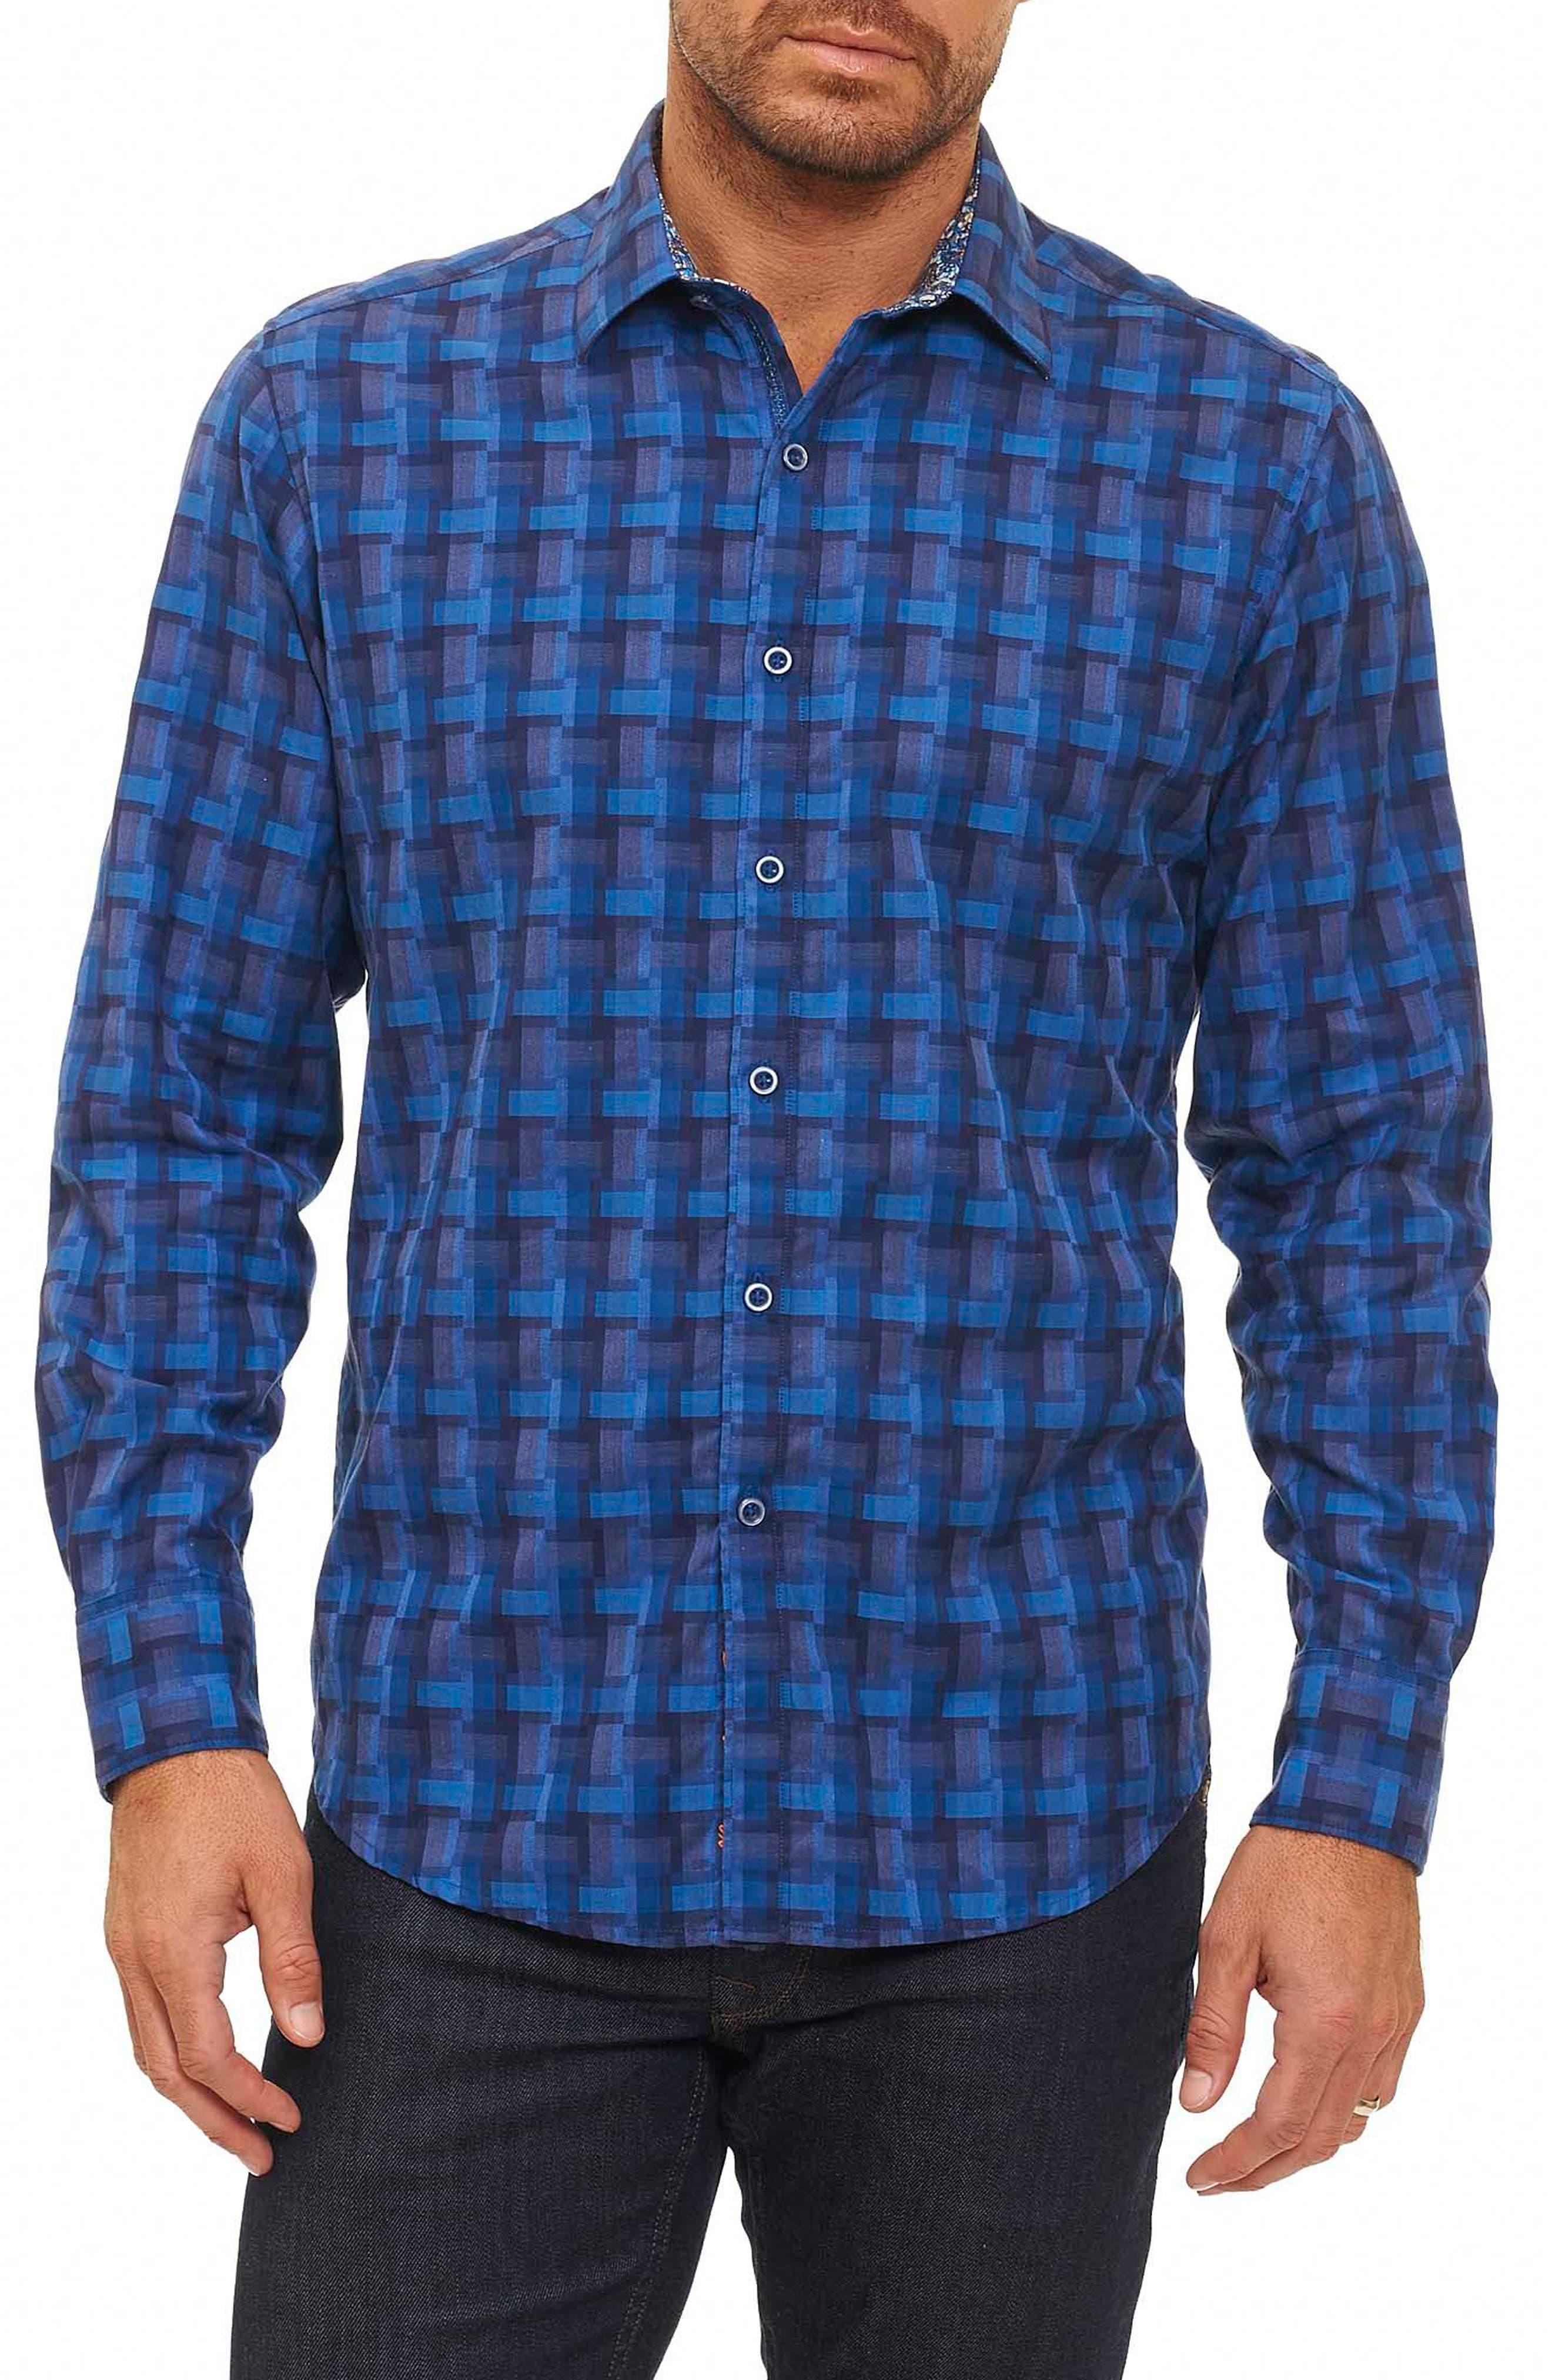 Alternate Image 1 Selected - Robert Graham Burman Classic Fit Sport Shirt